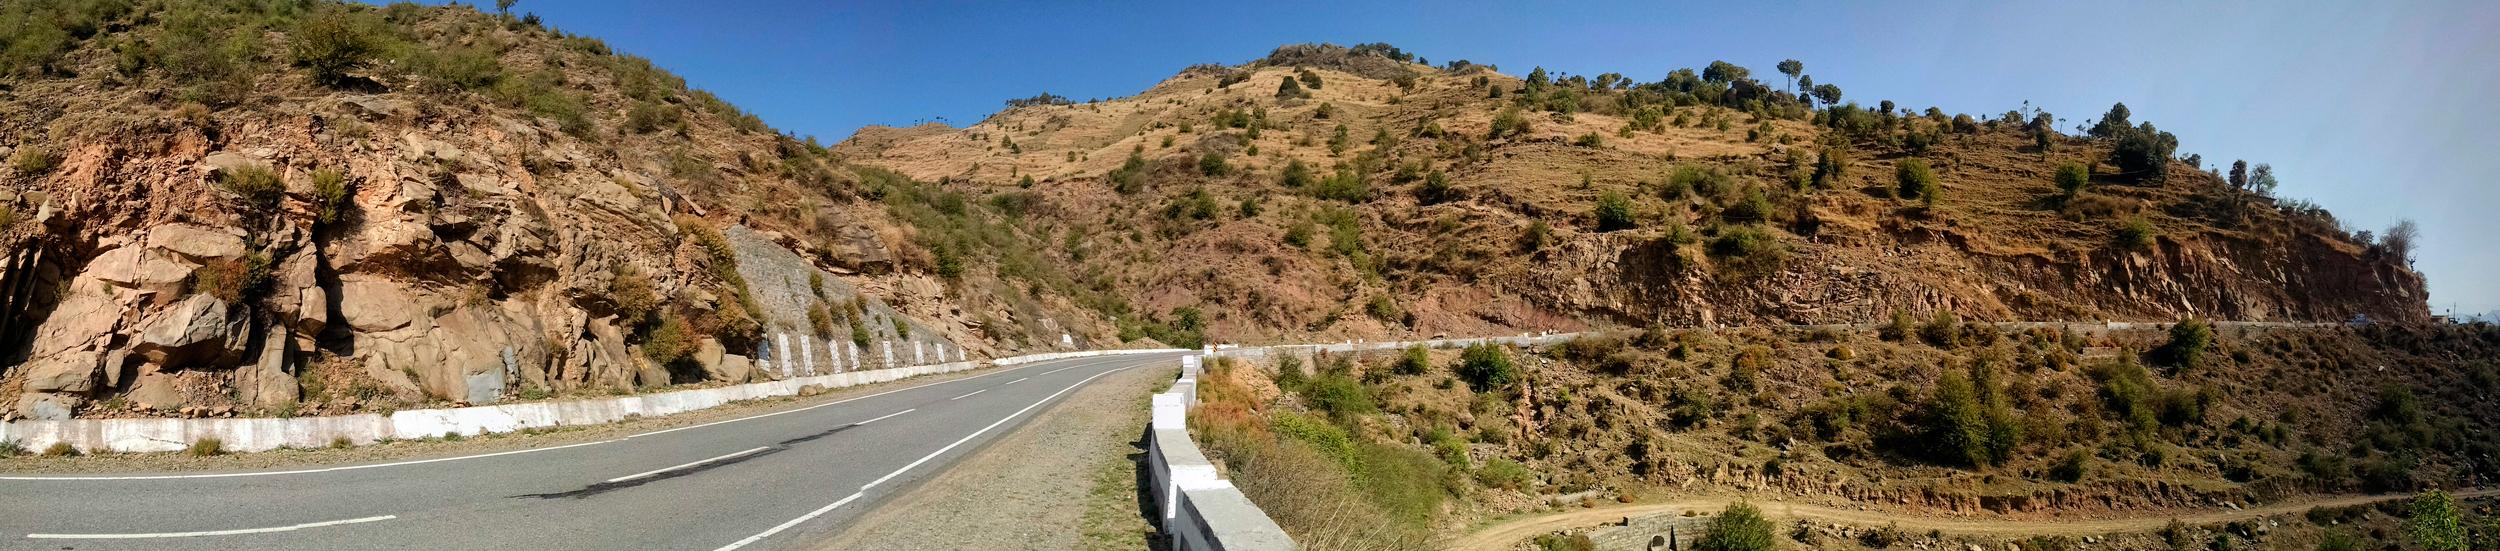 What beautiful roads.